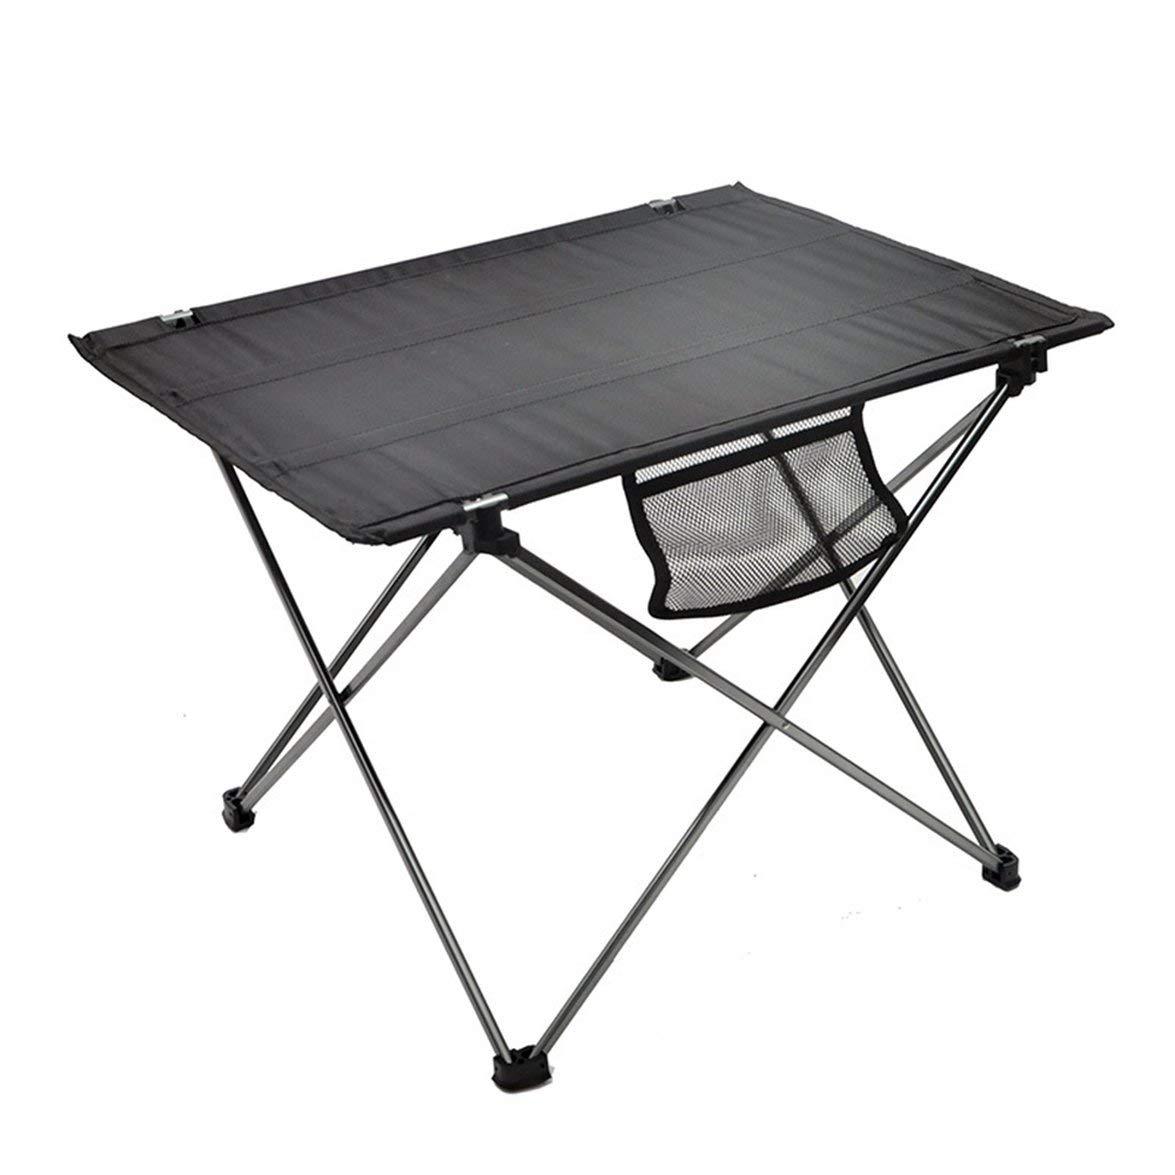 Pandamama Portable Folding Aluminum Roll Up Table Lightweight Outdoor Camping Picnic Ultra-Light Furniture Camping Table Tea Table by Pandamama